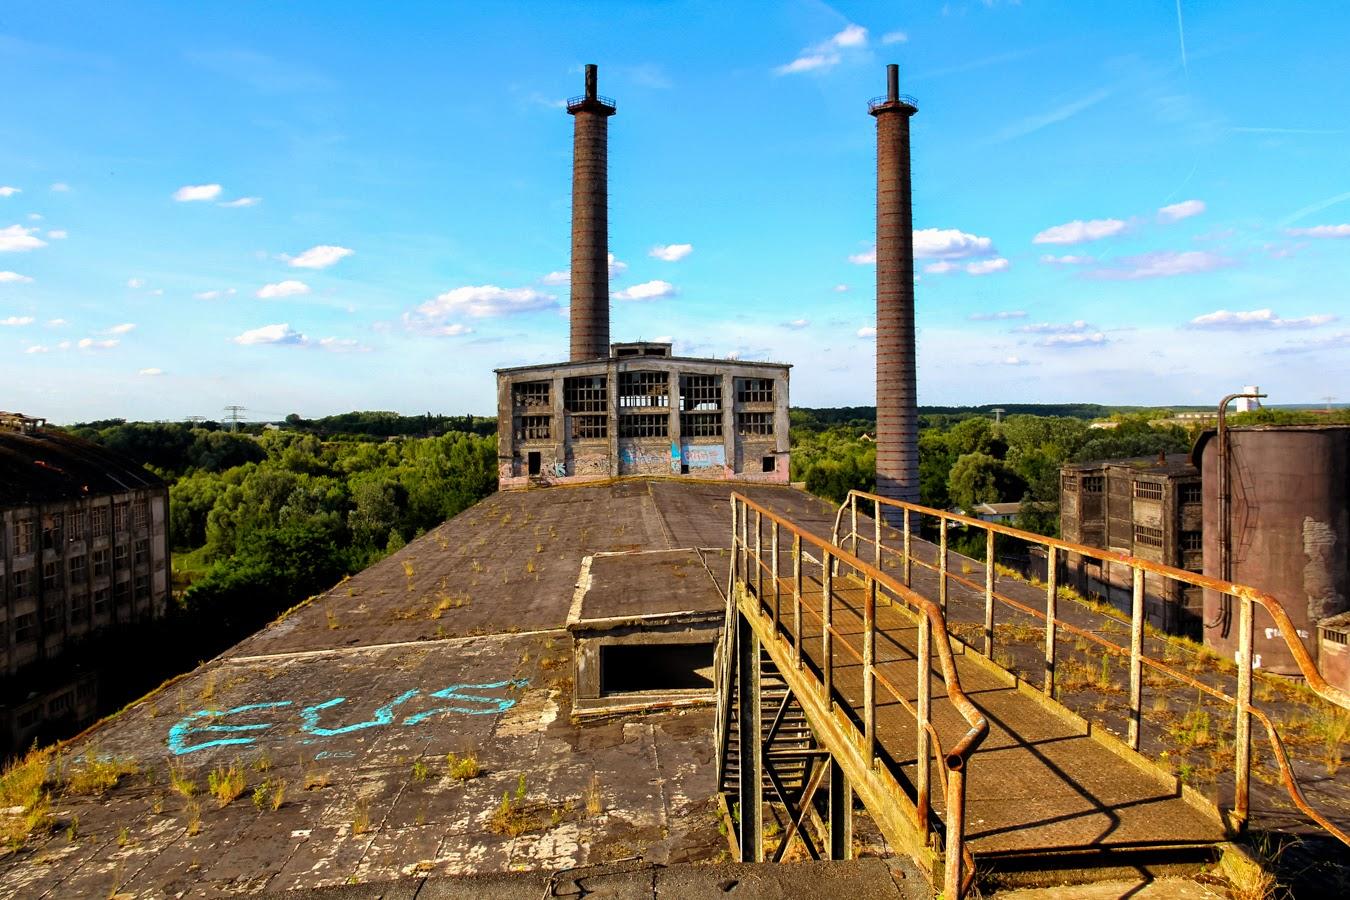 Abandoned Cement Factory : Colossus chemiewerk rüdersdorf abandoned berlin